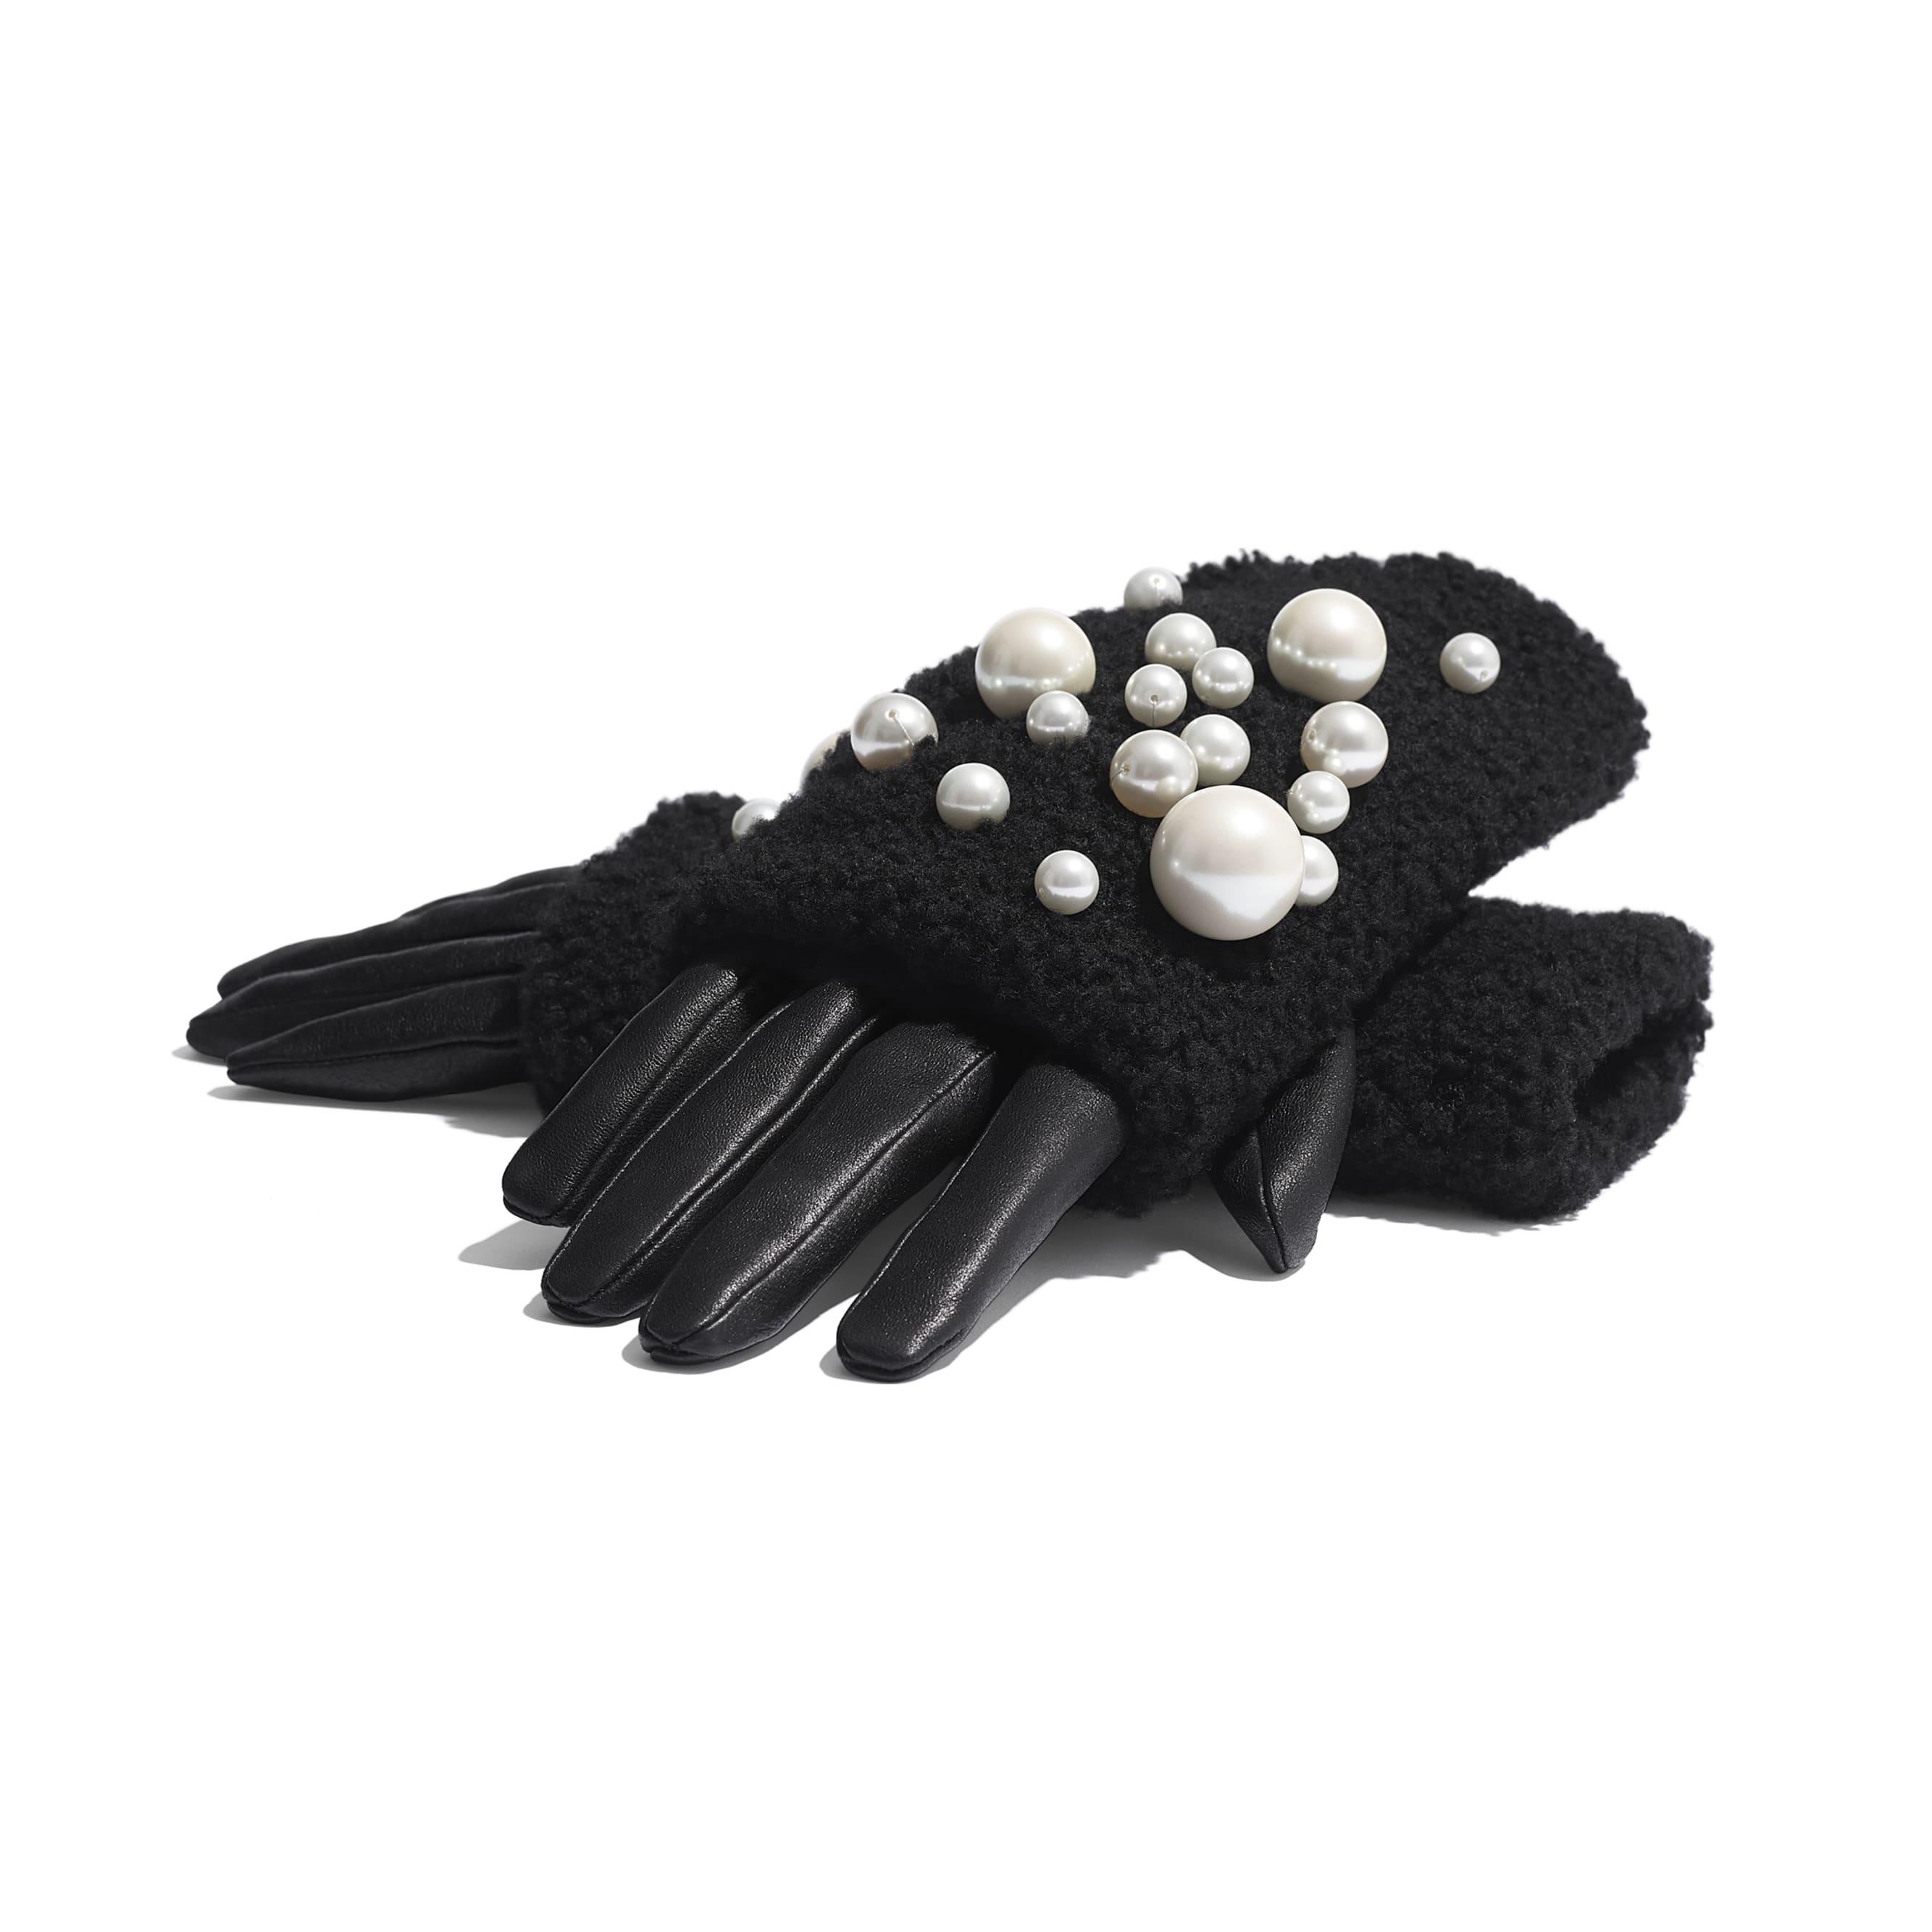 Gloves - Black - Lambskin, Shearling & Pearls - Alternative view - see standard sized version